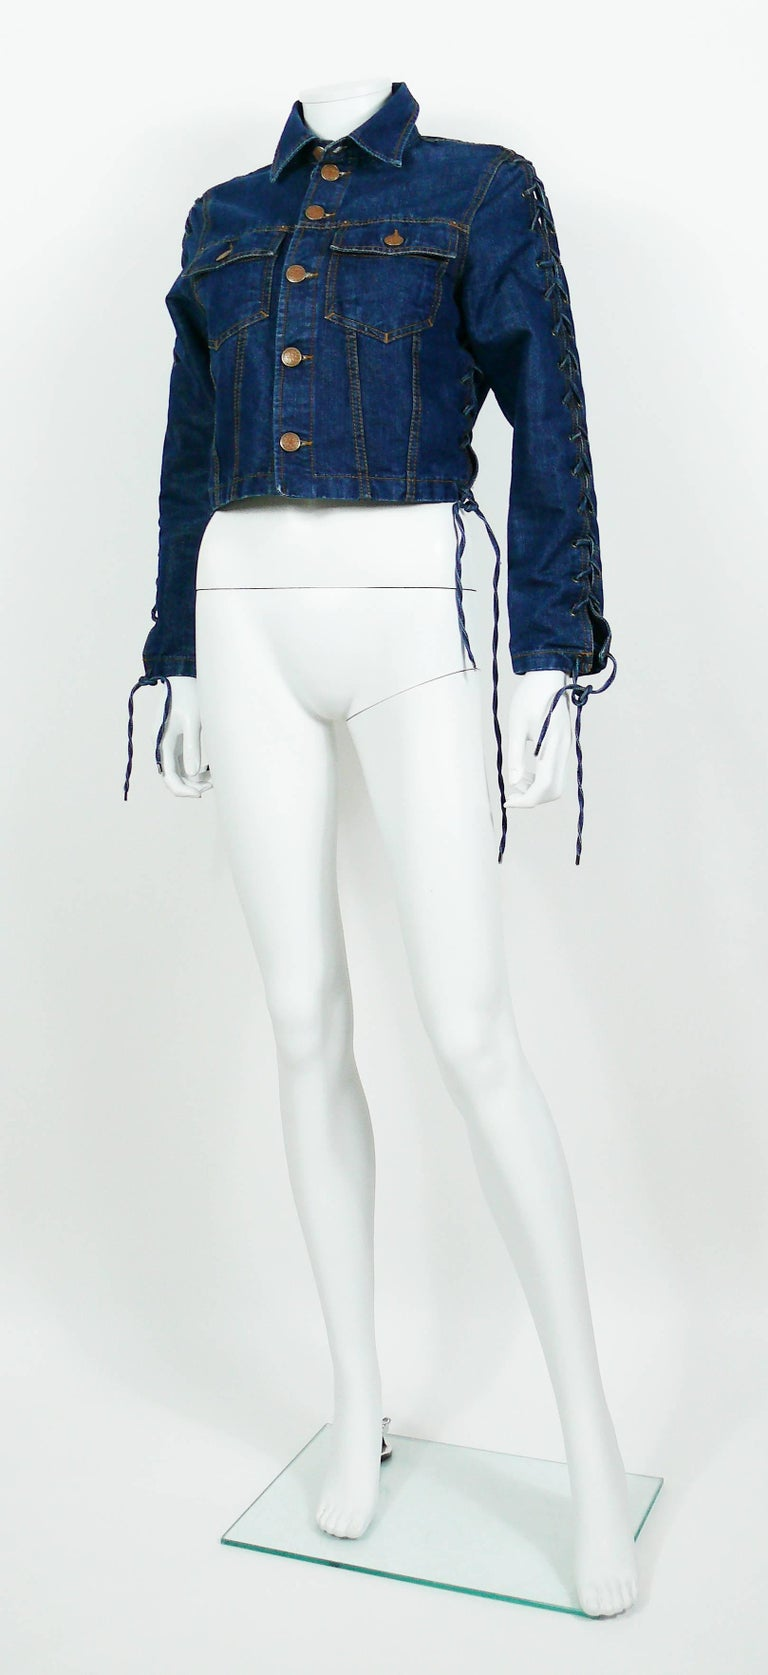 Jean Paul Gaultier Vintage Laced Denim Cropped Jacket For Sale 1